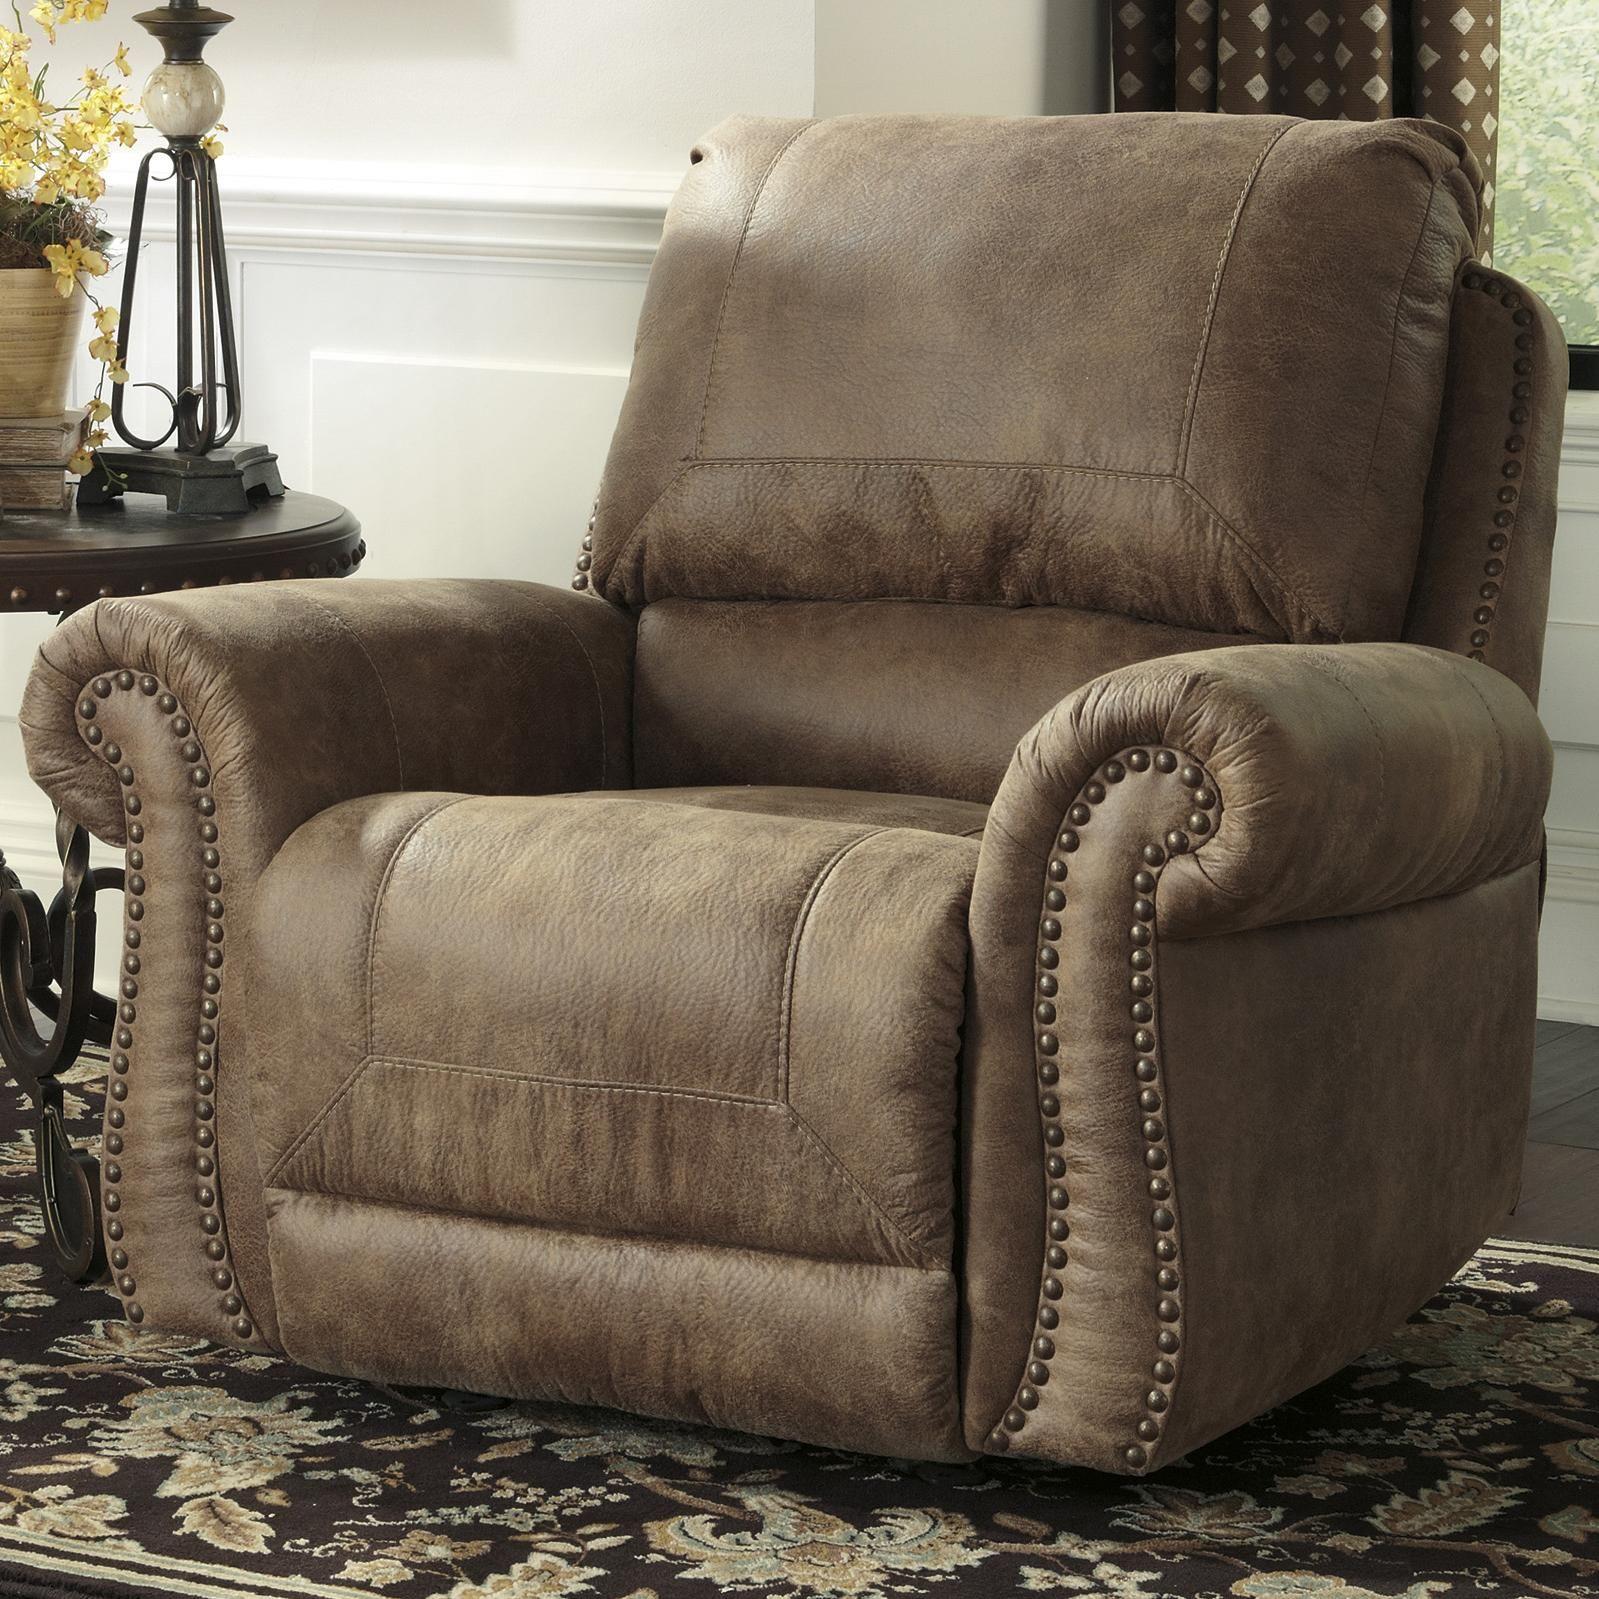 Gorgeous Cream Leather Conversation Sofa Wwwawfurniture Sofa